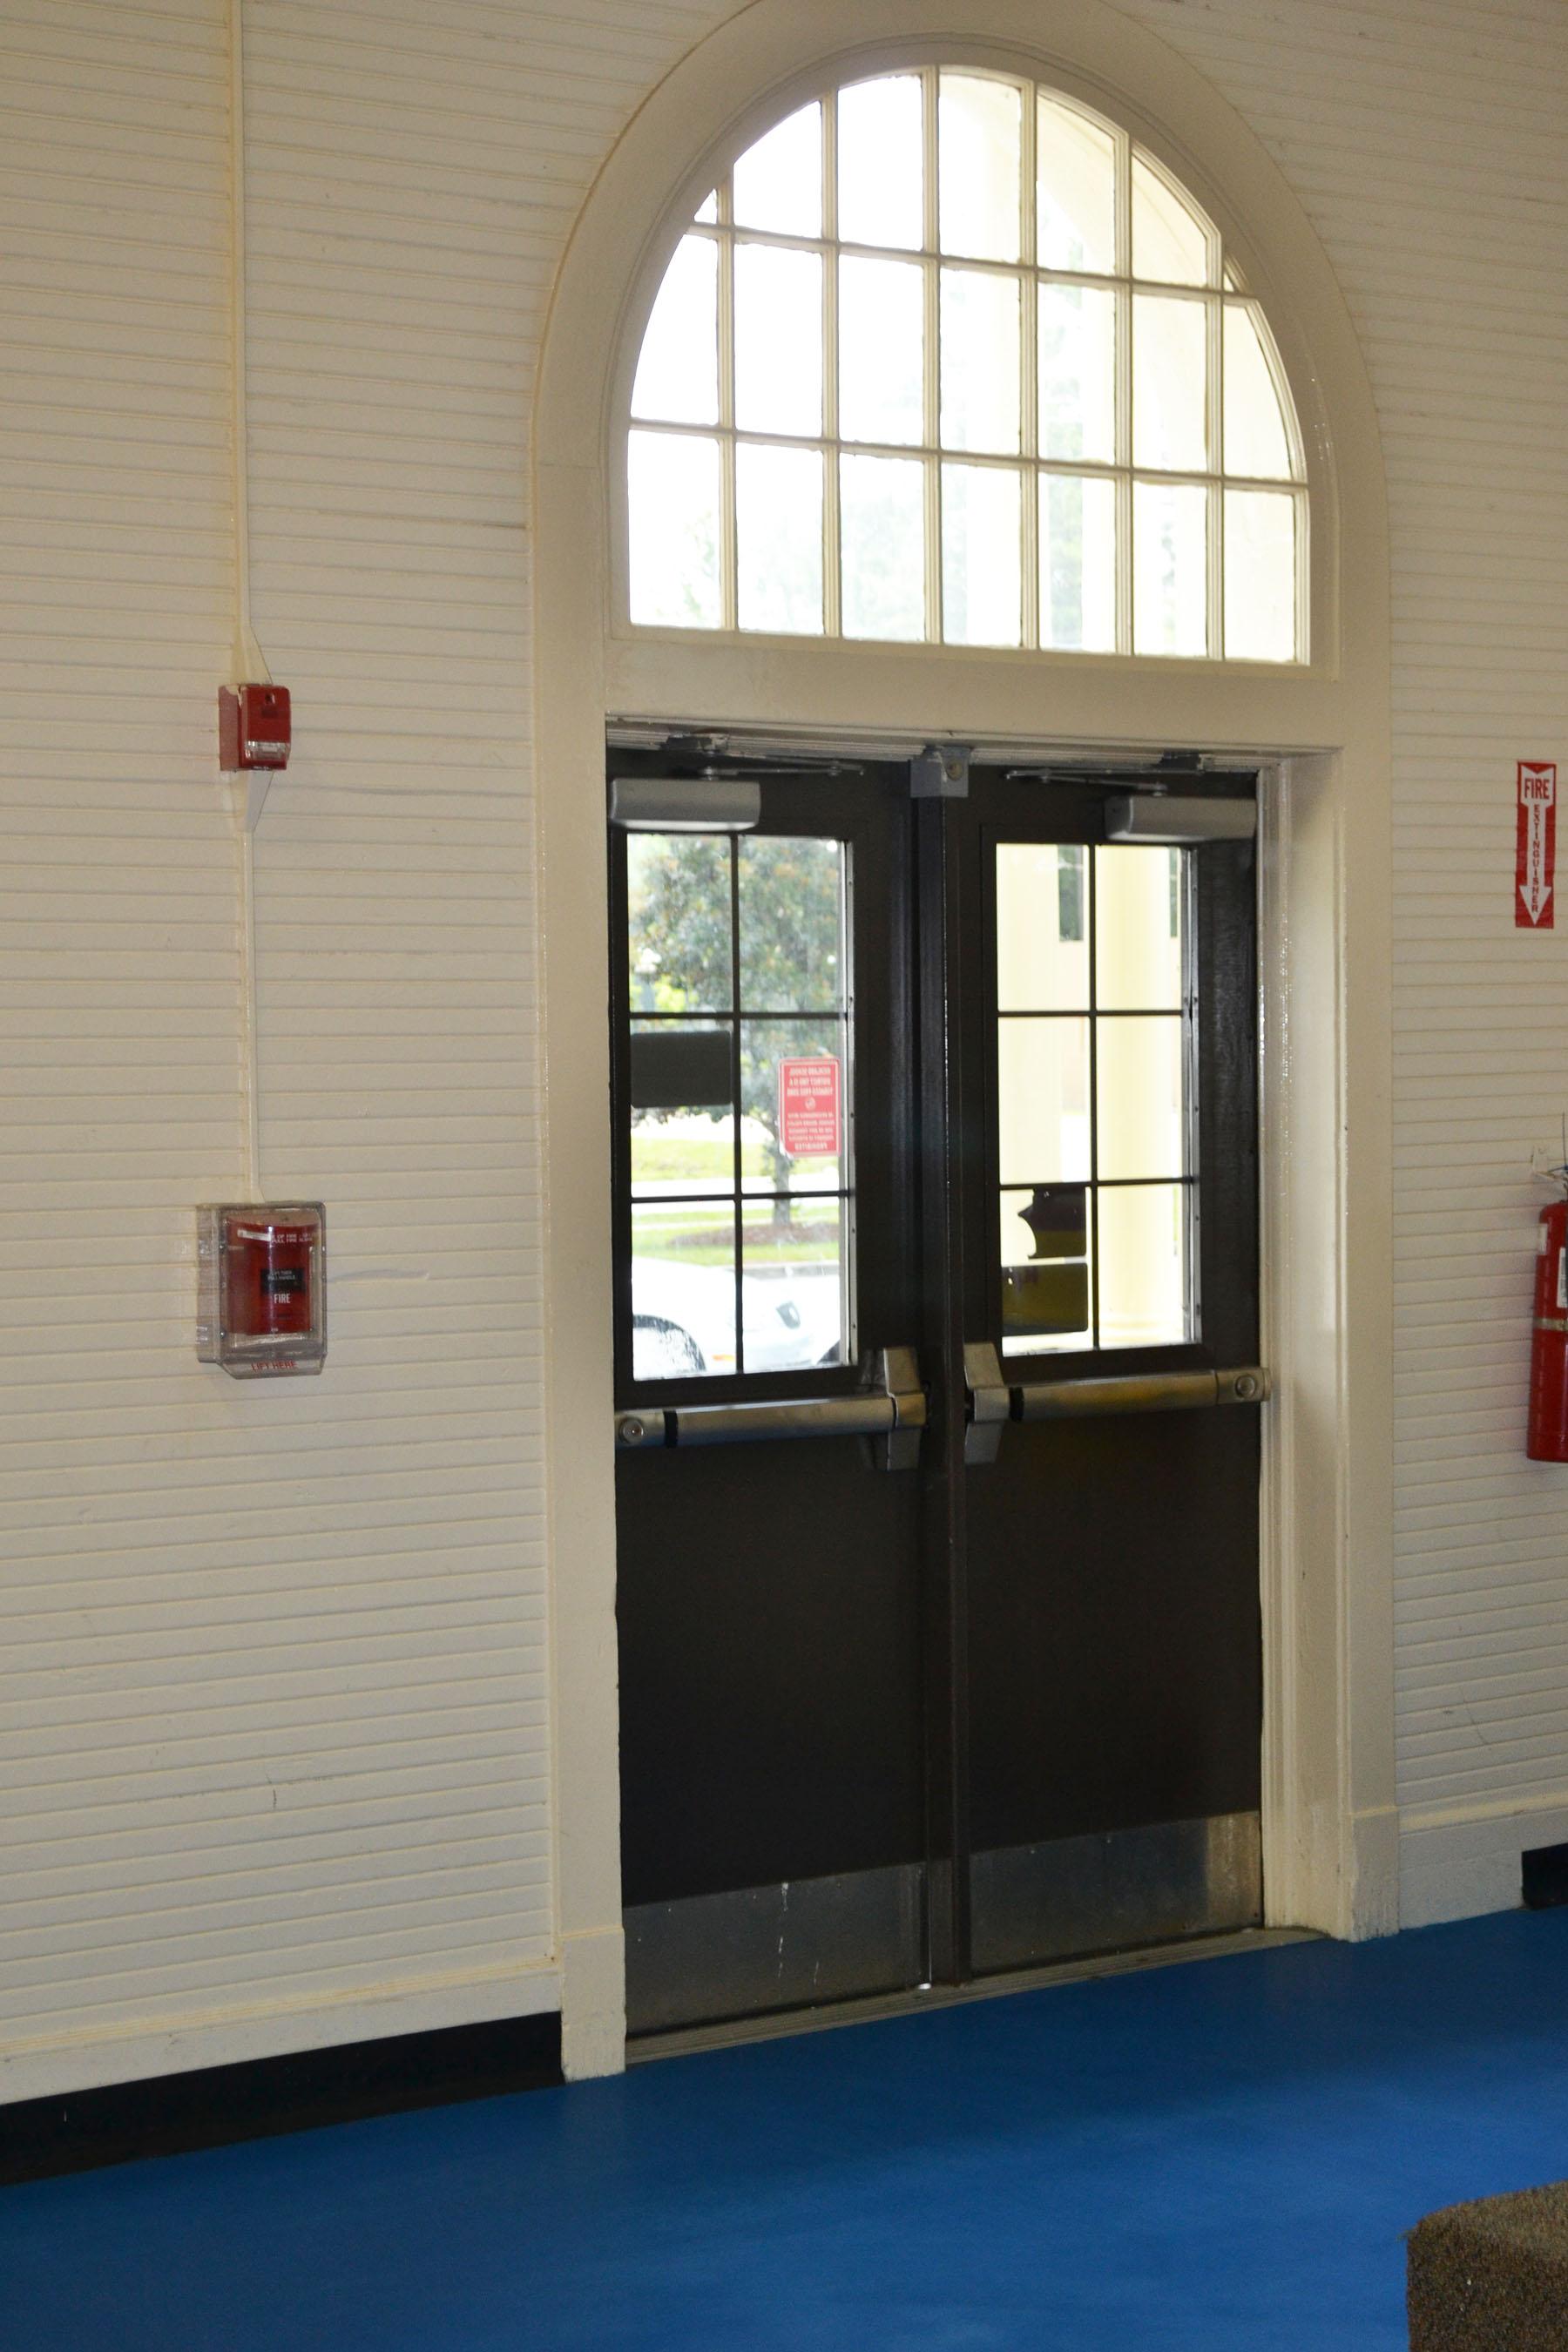 Blythewood School Gym Front Door.  Photo Taken by Jim McLean August 2014.